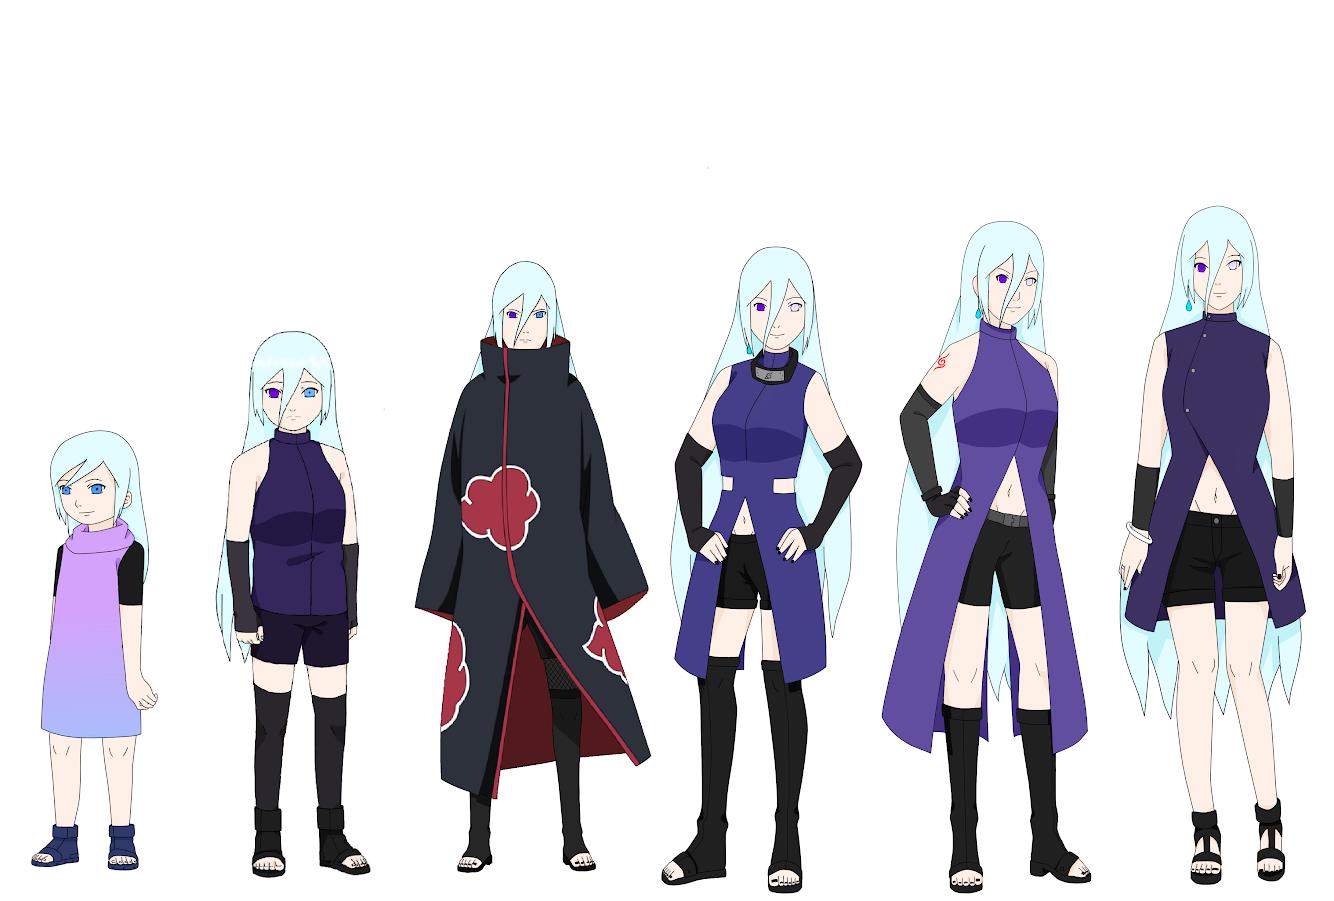 Yukimi's Timeline Anime, Nova geração